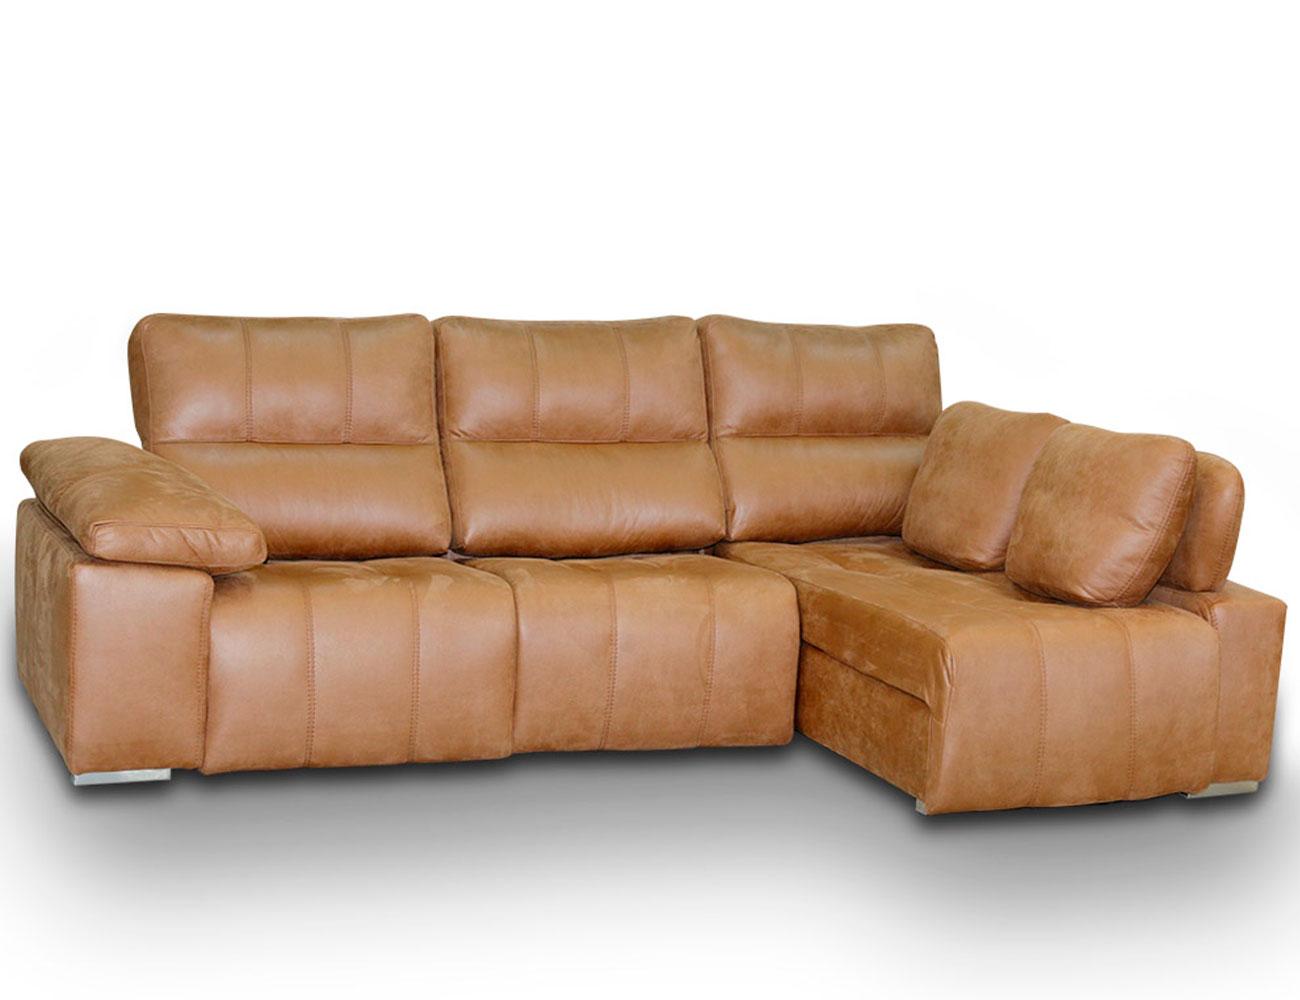 Sofa chaiselongue relax 2 motores anti manchas17